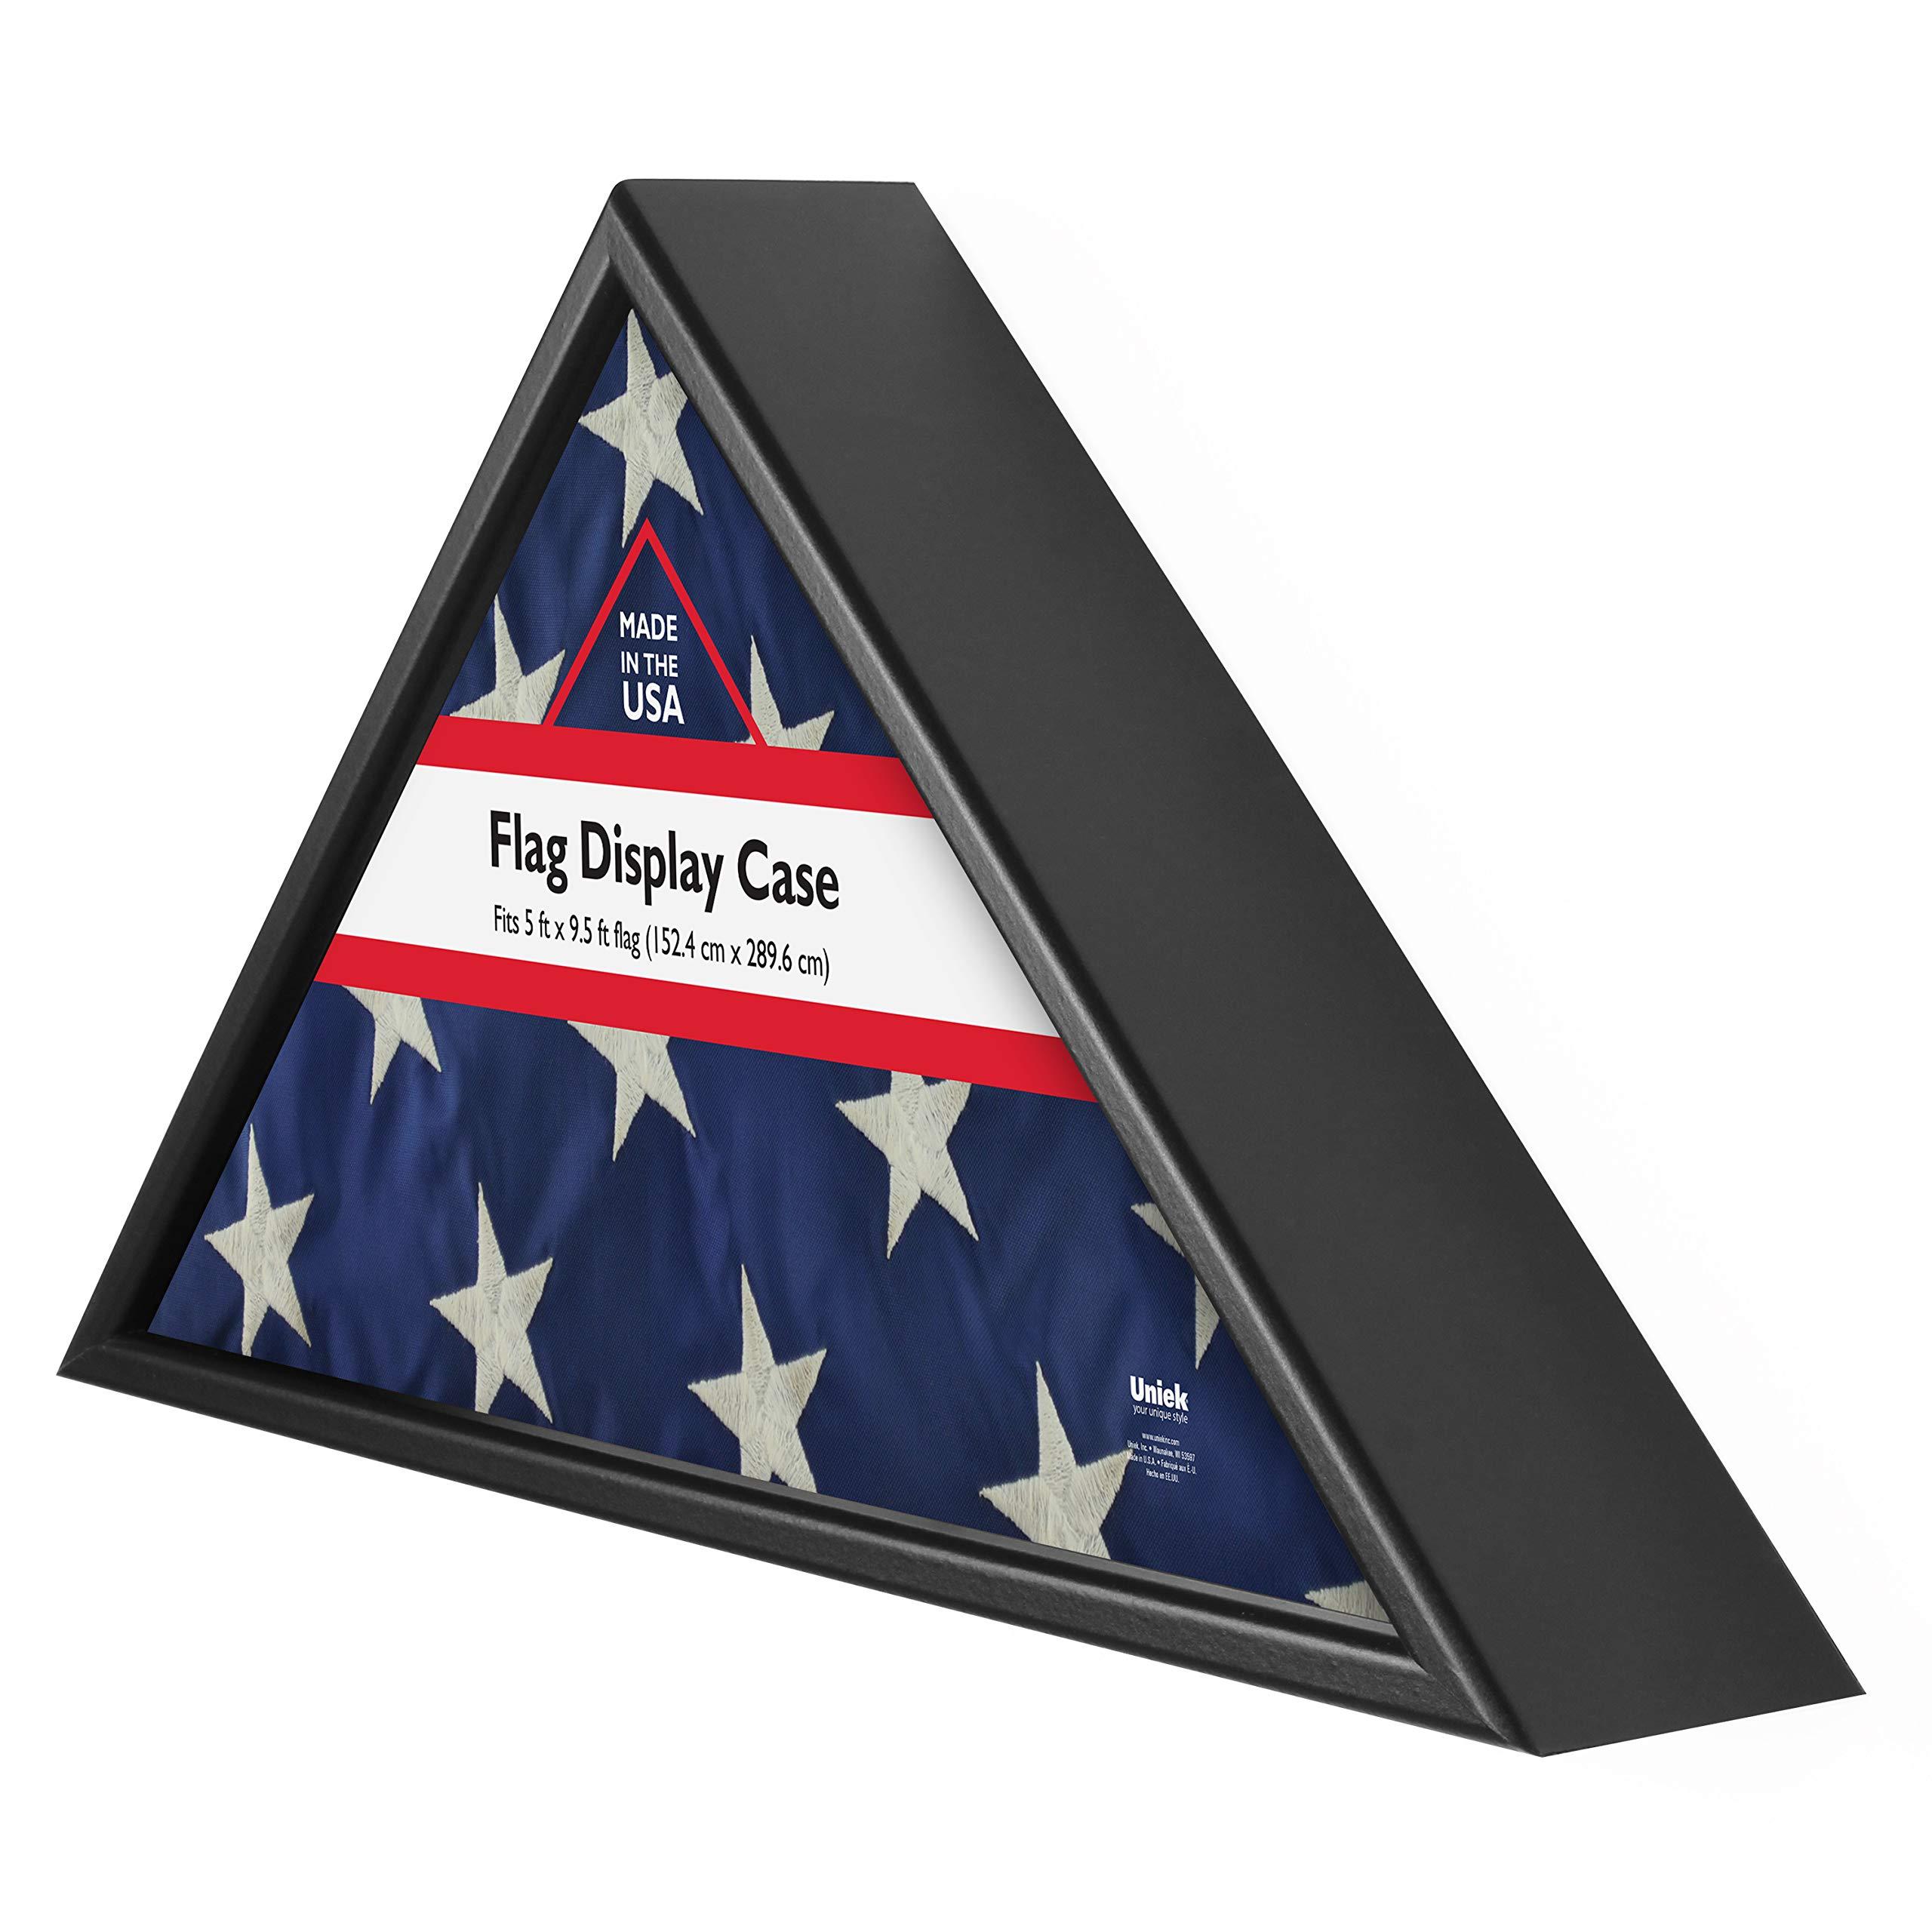 DesignOvation Memorial Flag Case, Black Wood, Made in USA, Holds 5'Hx9.5'W Folded Flag